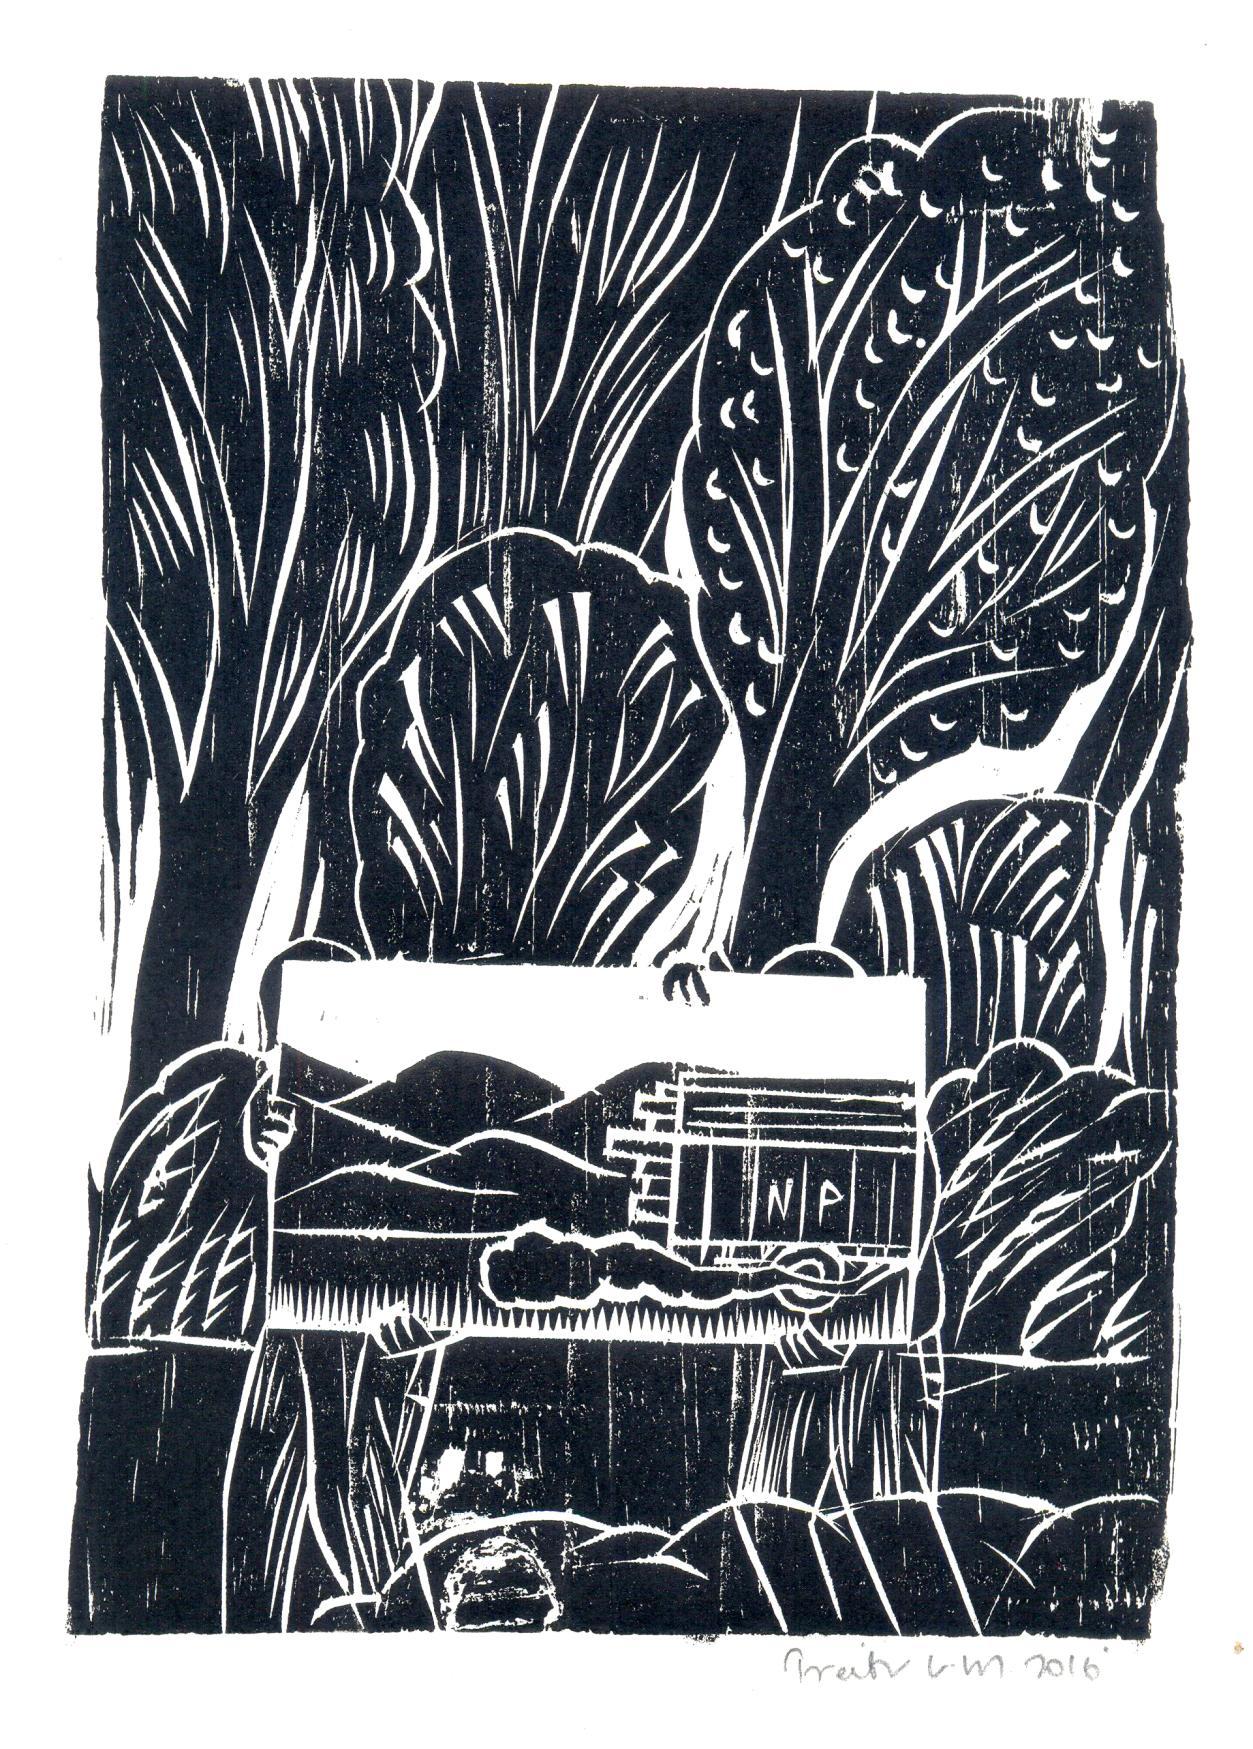 "Treibor Mawlong   NP (National Permit)   Woodcut print   9.5"" x 7""   2016"